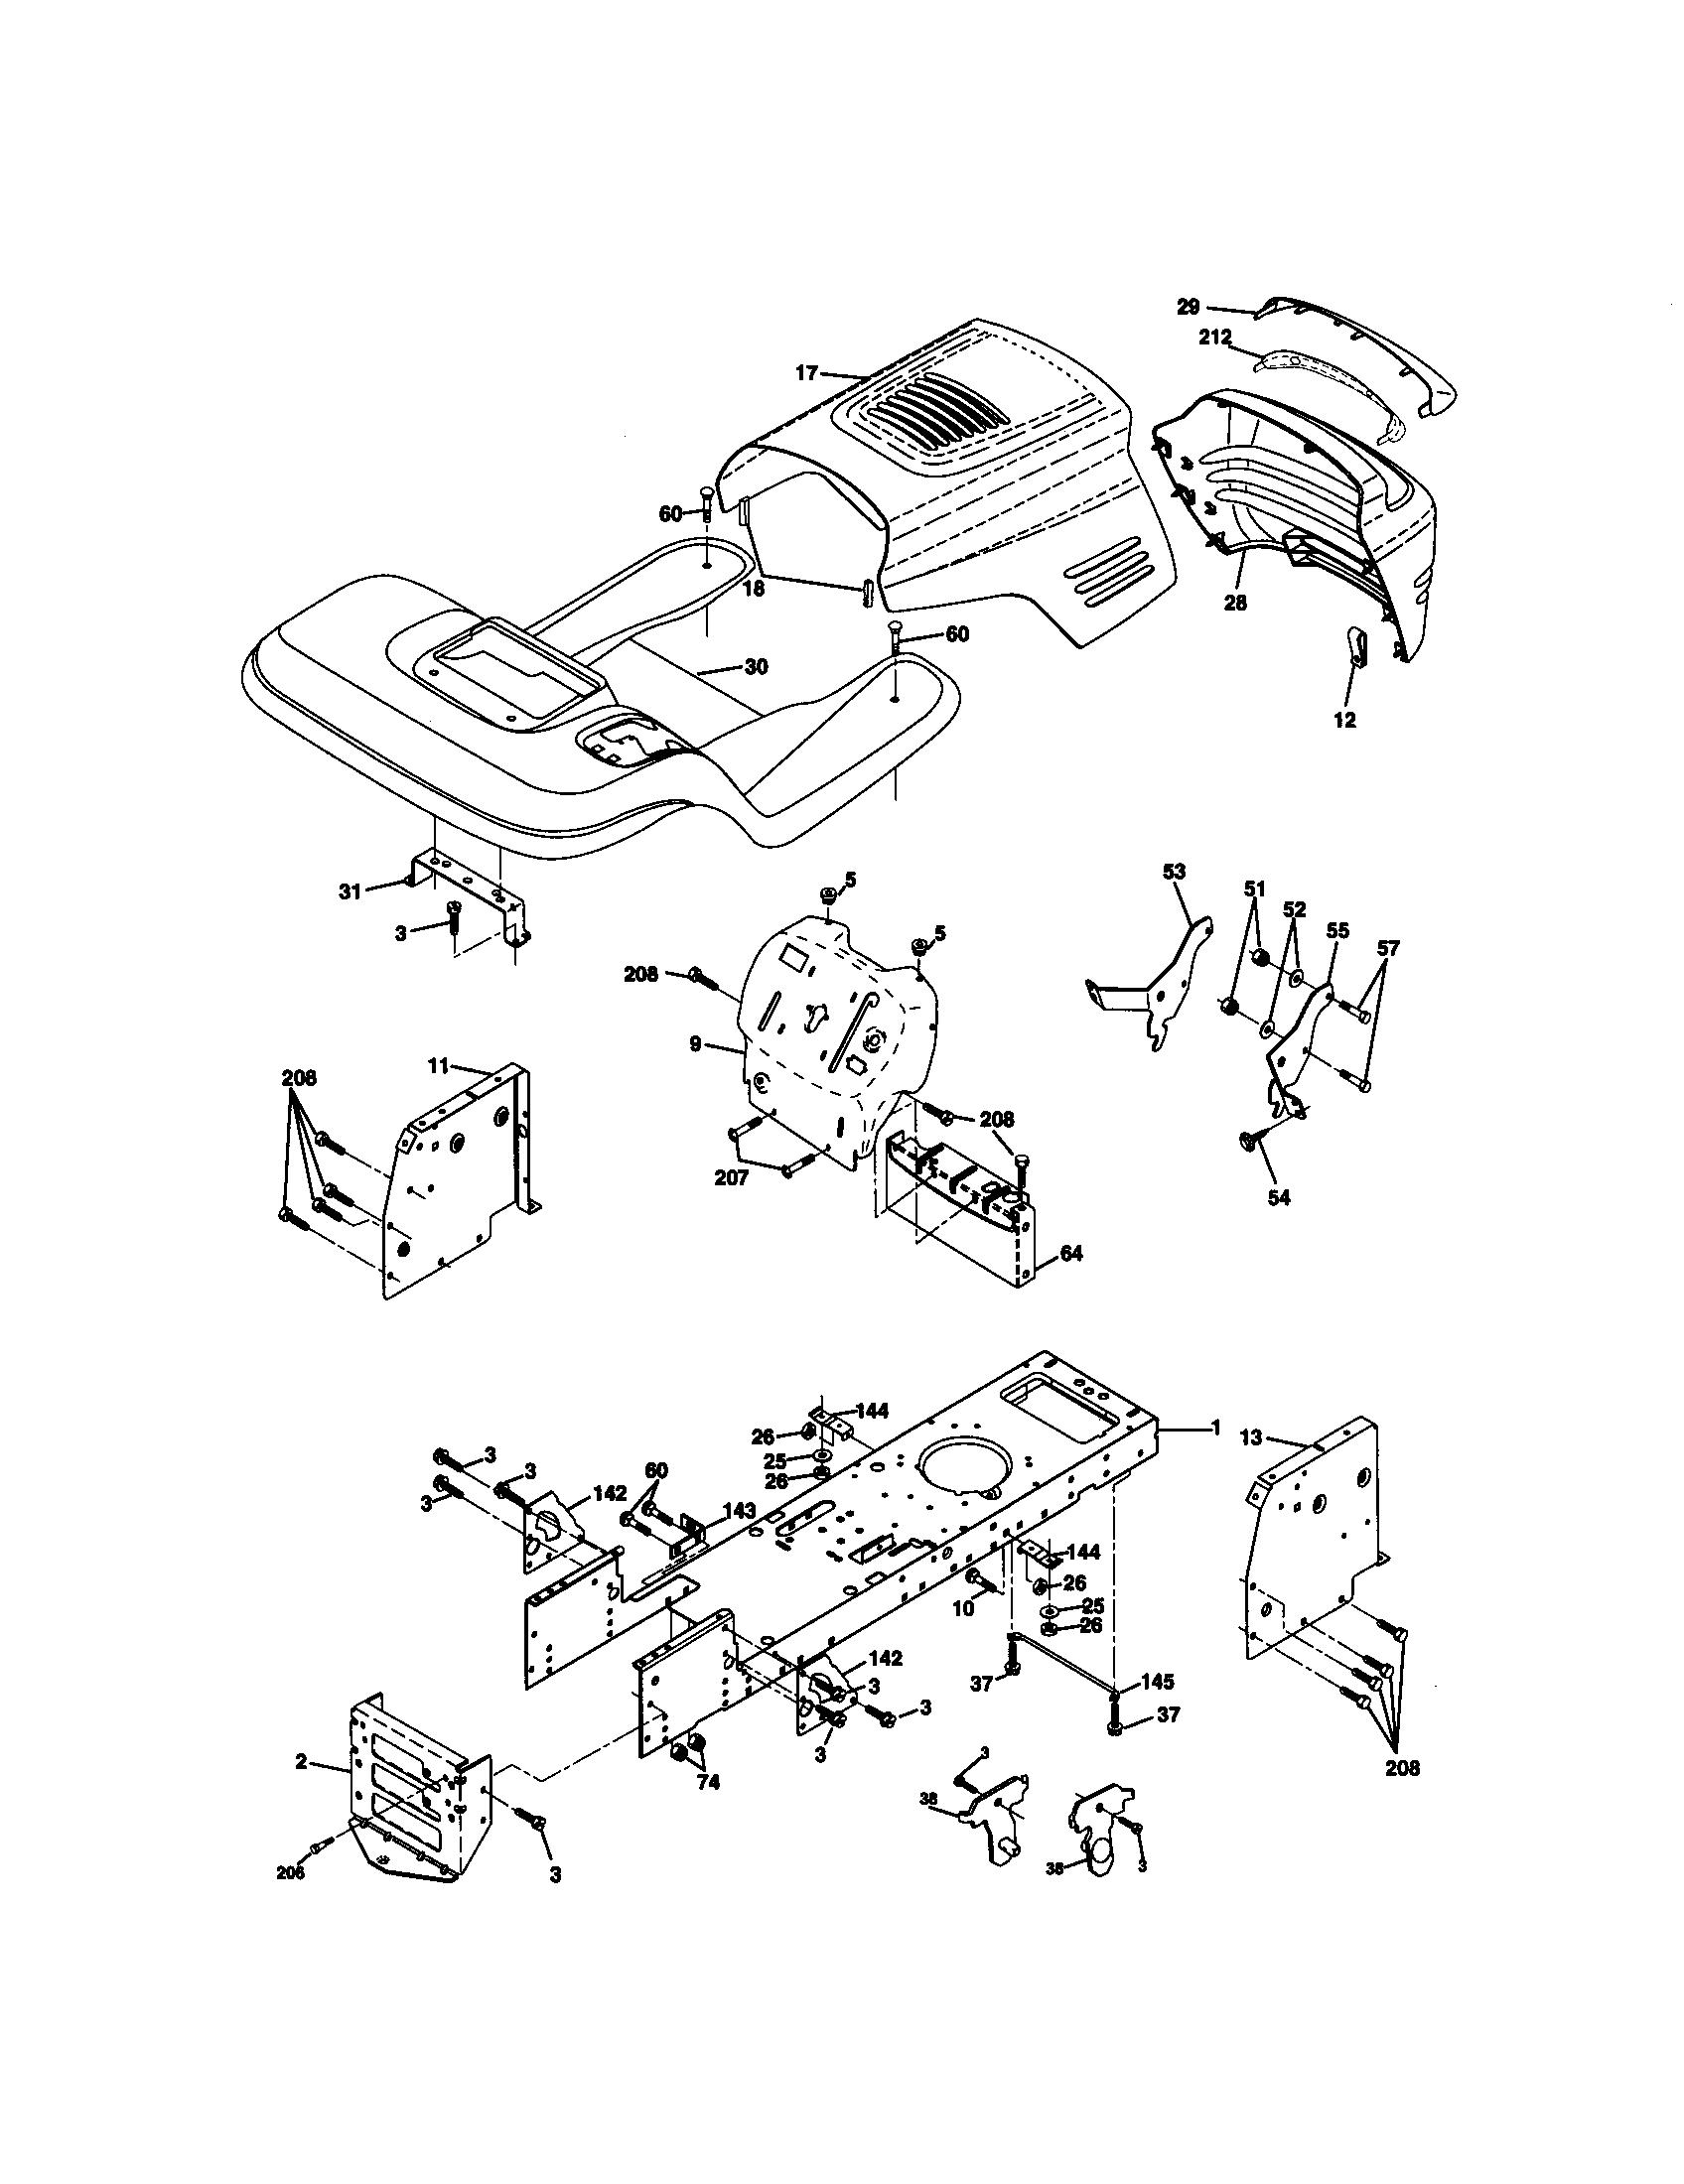 Craftsman Lt1000 Wiring Harness Diagram Craftsman Lt1000